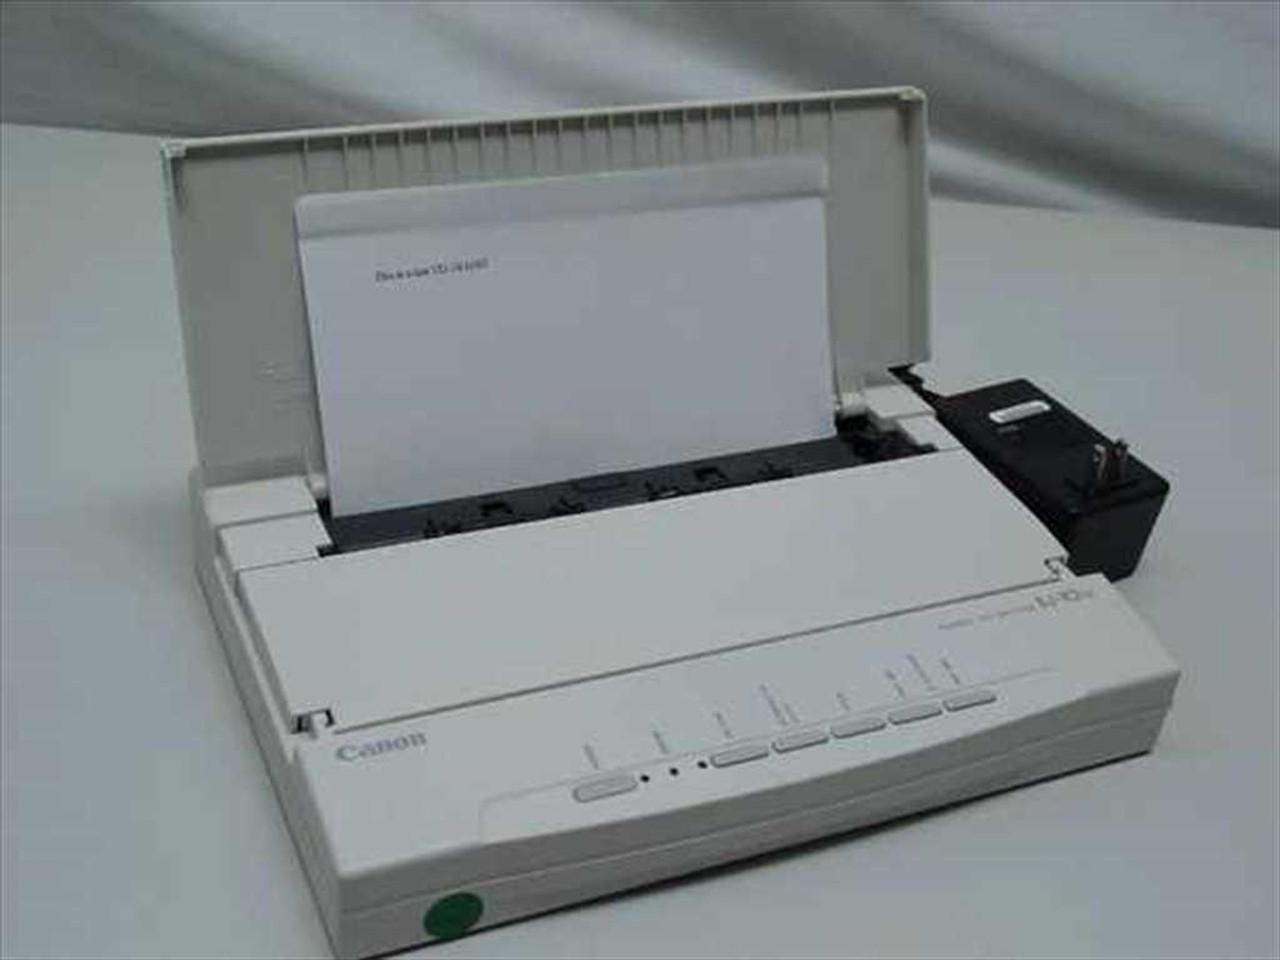 Canon bubble jet printer bj-10sx